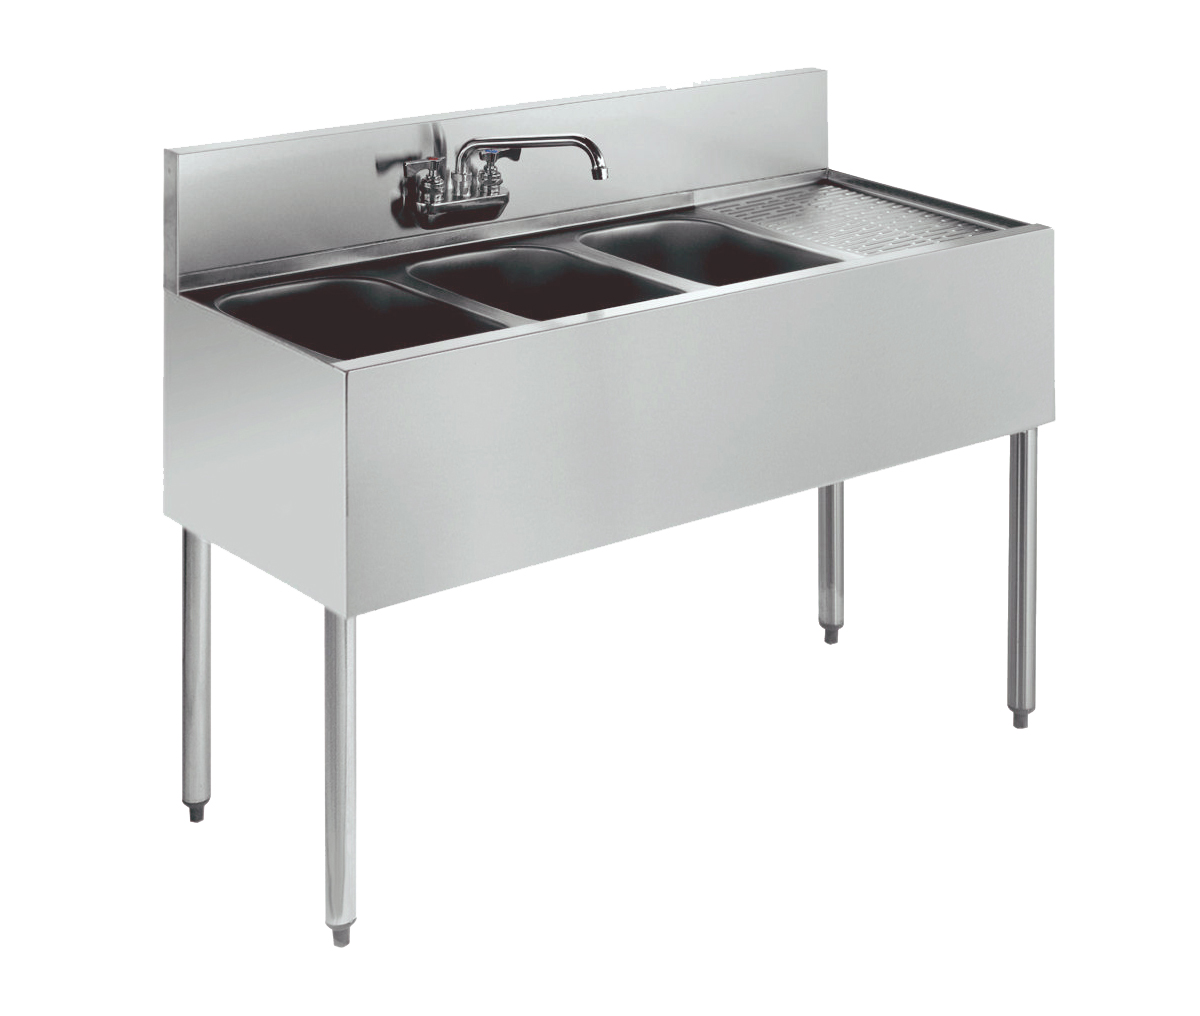 Krowne Metal KR21-43L underbar sink units